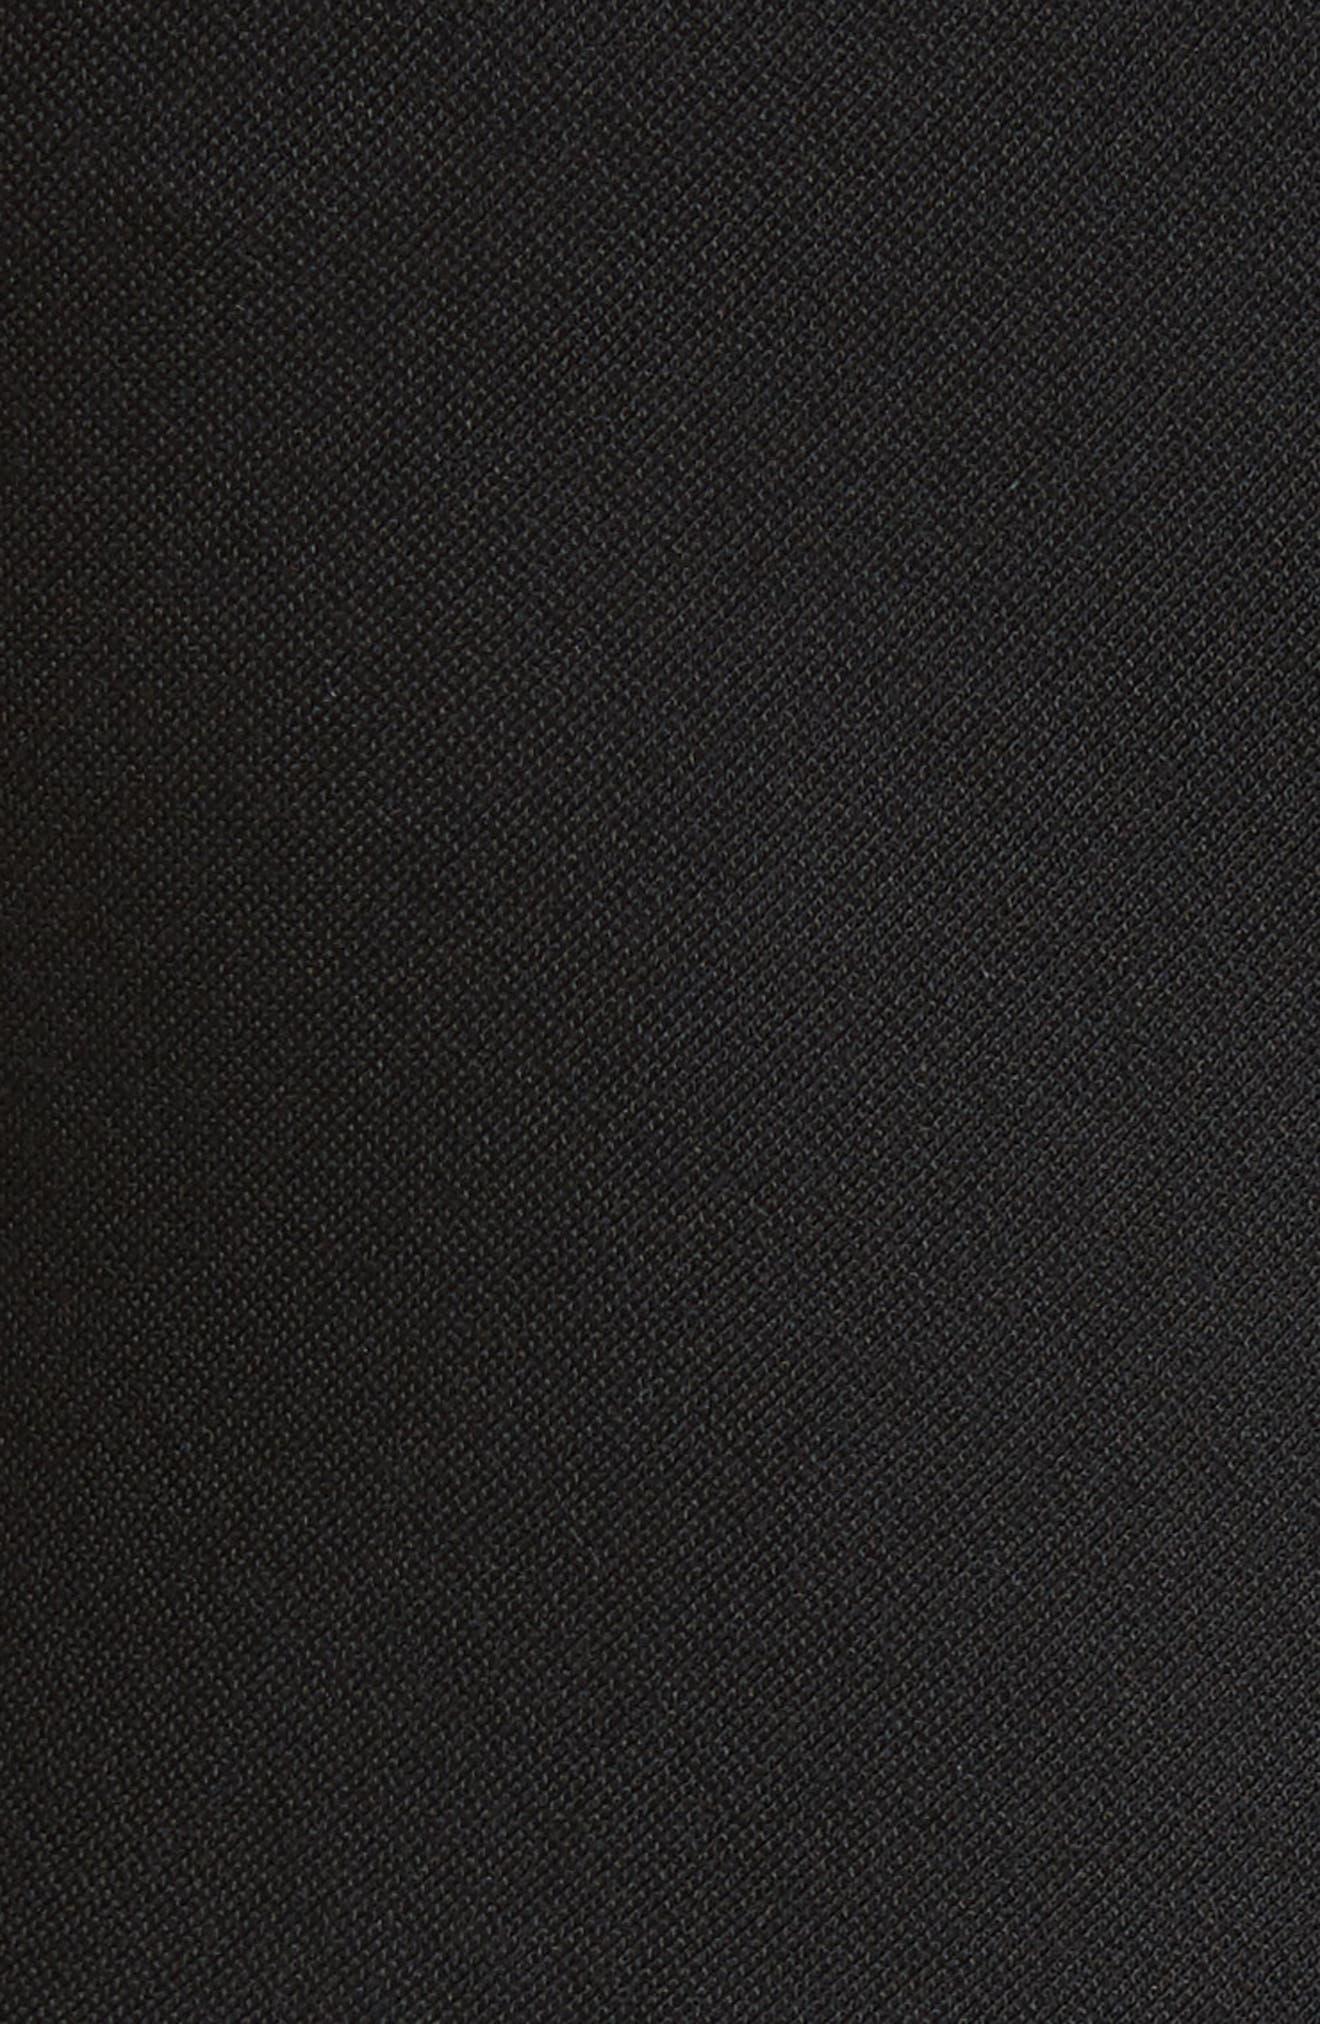 One-Shoulder Asymmetrical Jersey Dress,                             Alternate thumbnail 5, color,                             001